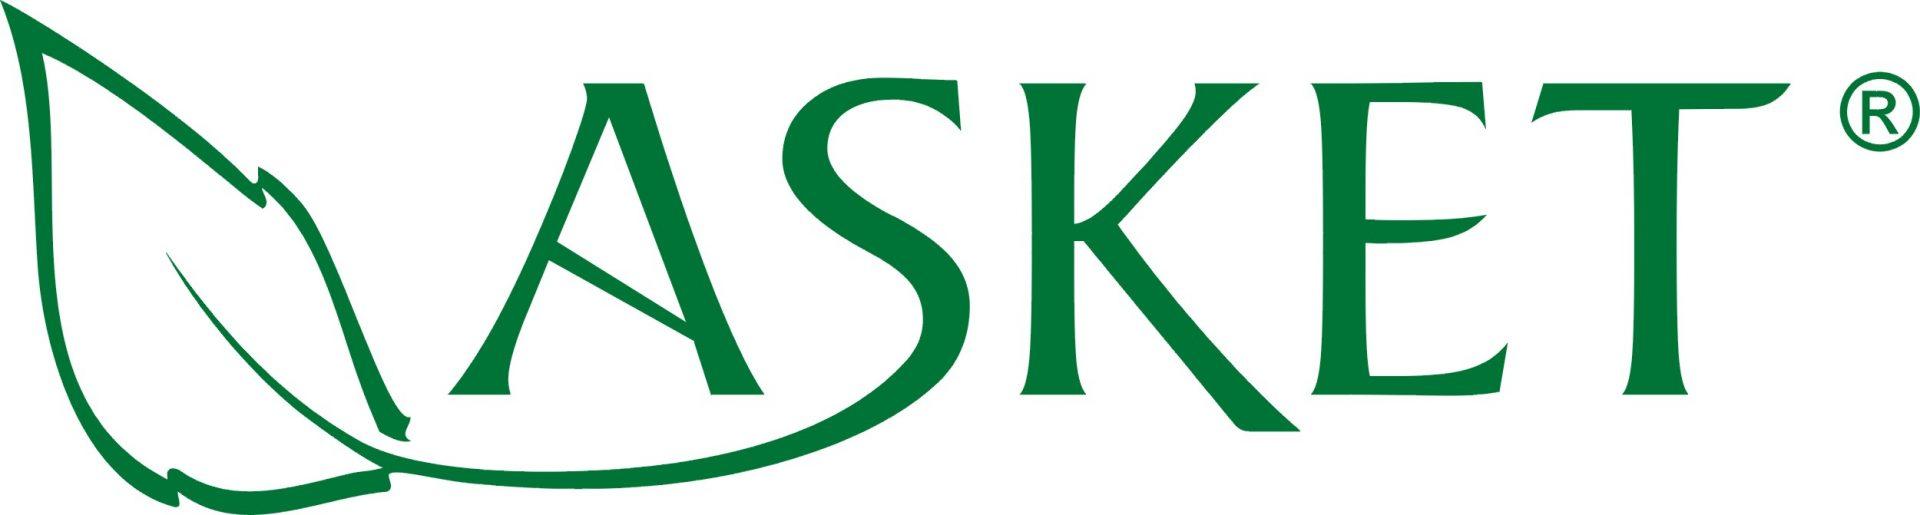 logo_asket_300dpi_bo